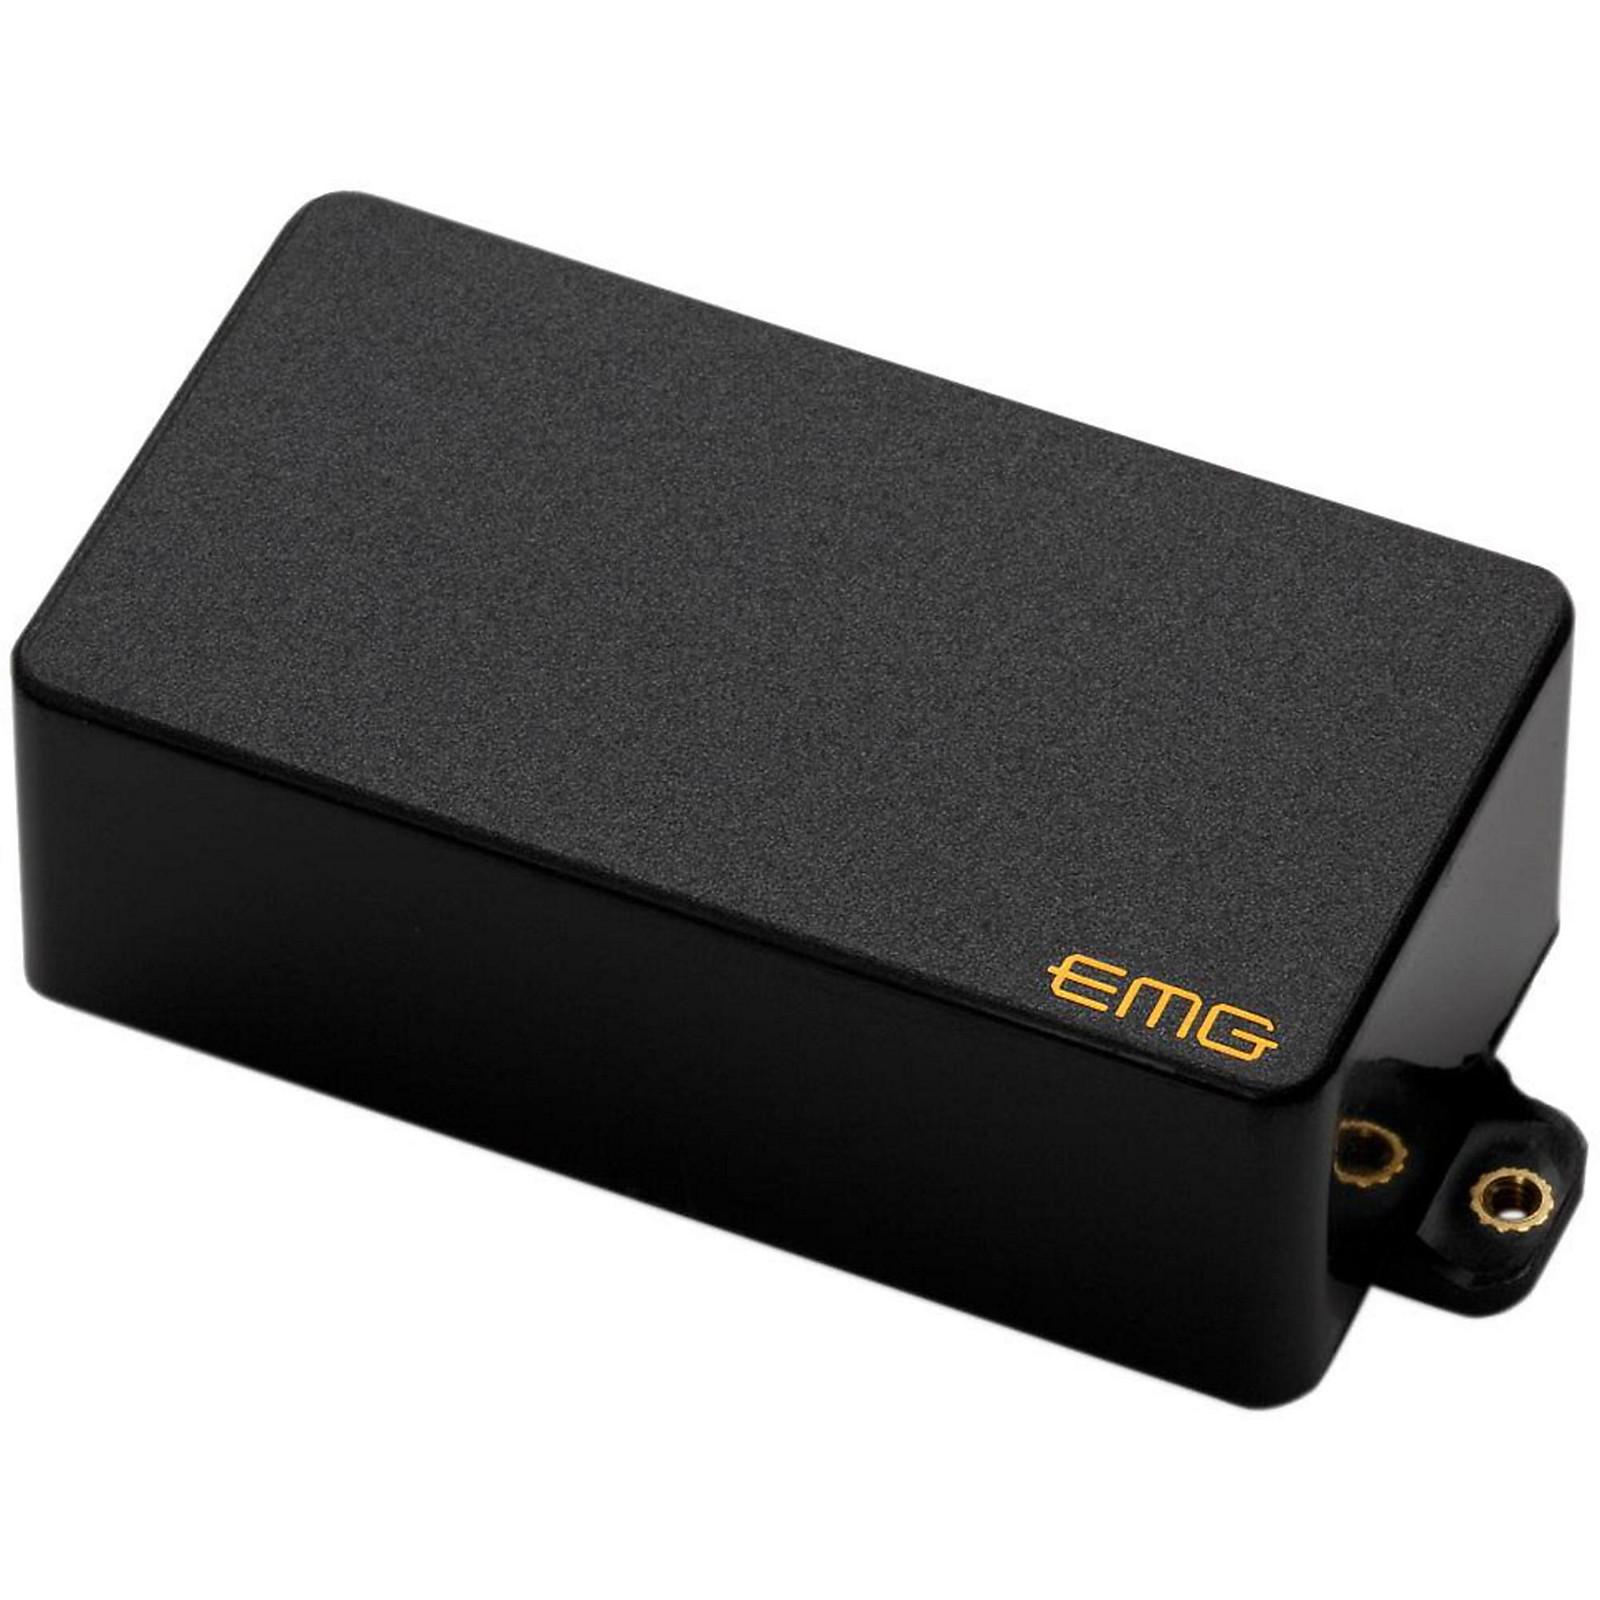 EMG EMG-81TW Active Dual-Mode Humbucker Guitar Pickup